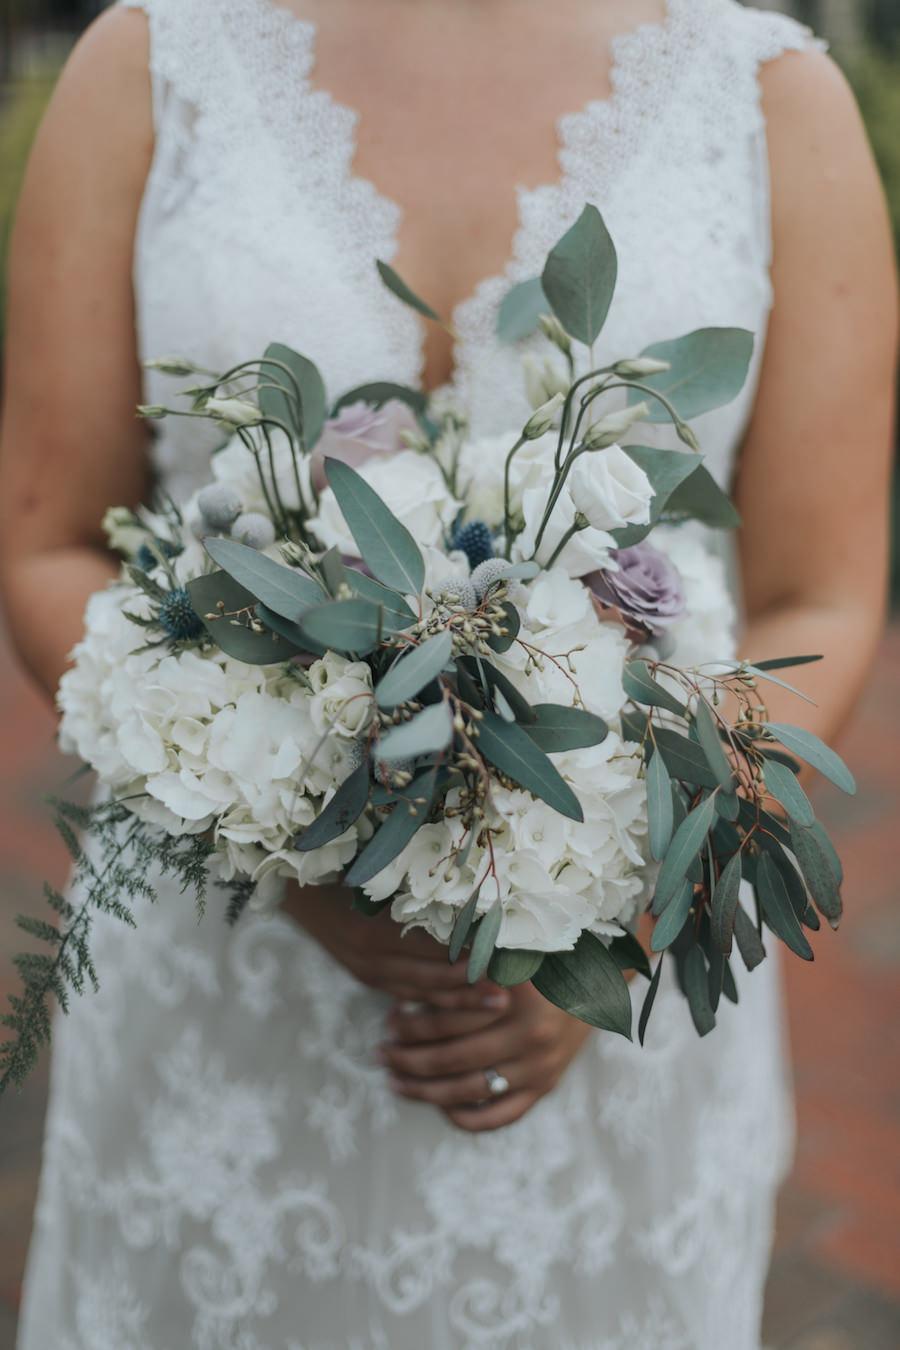 Bridal Wedding Portrait in Sleeveless Ivory Lace Wedding Dress with Ivory, Purple and Greenery Bridal Wedding Bouquet with Eucalyptus | Tampa Bay Wedding Florist Wonderland Floral Art